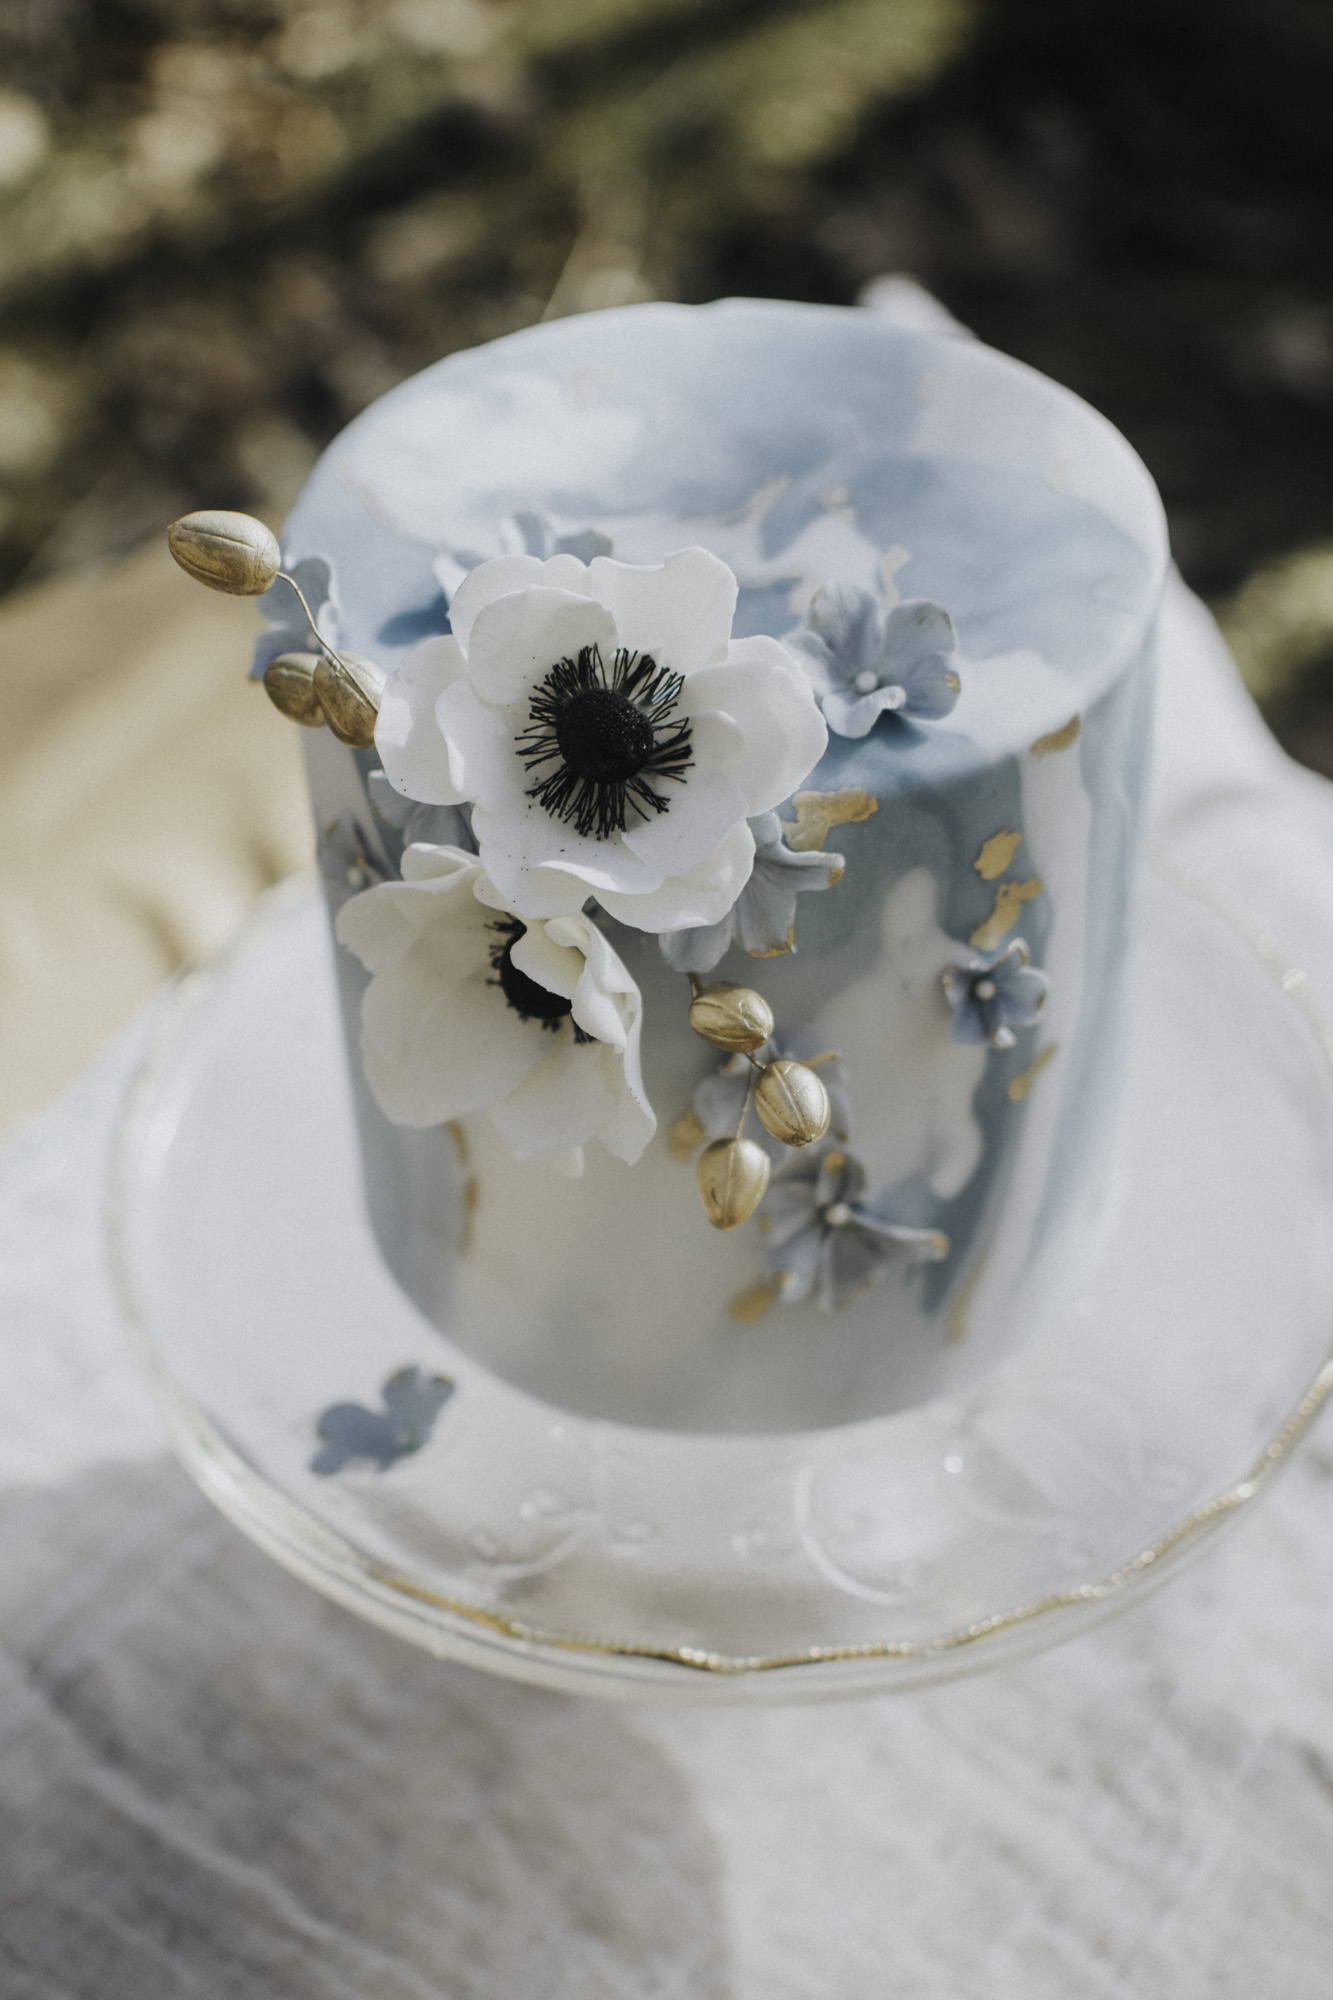 Cate_Ann_Photography_Dayton_Ohio_Wedding_Elopement_And_Engagement_PhotographerDSC_5571.jpg